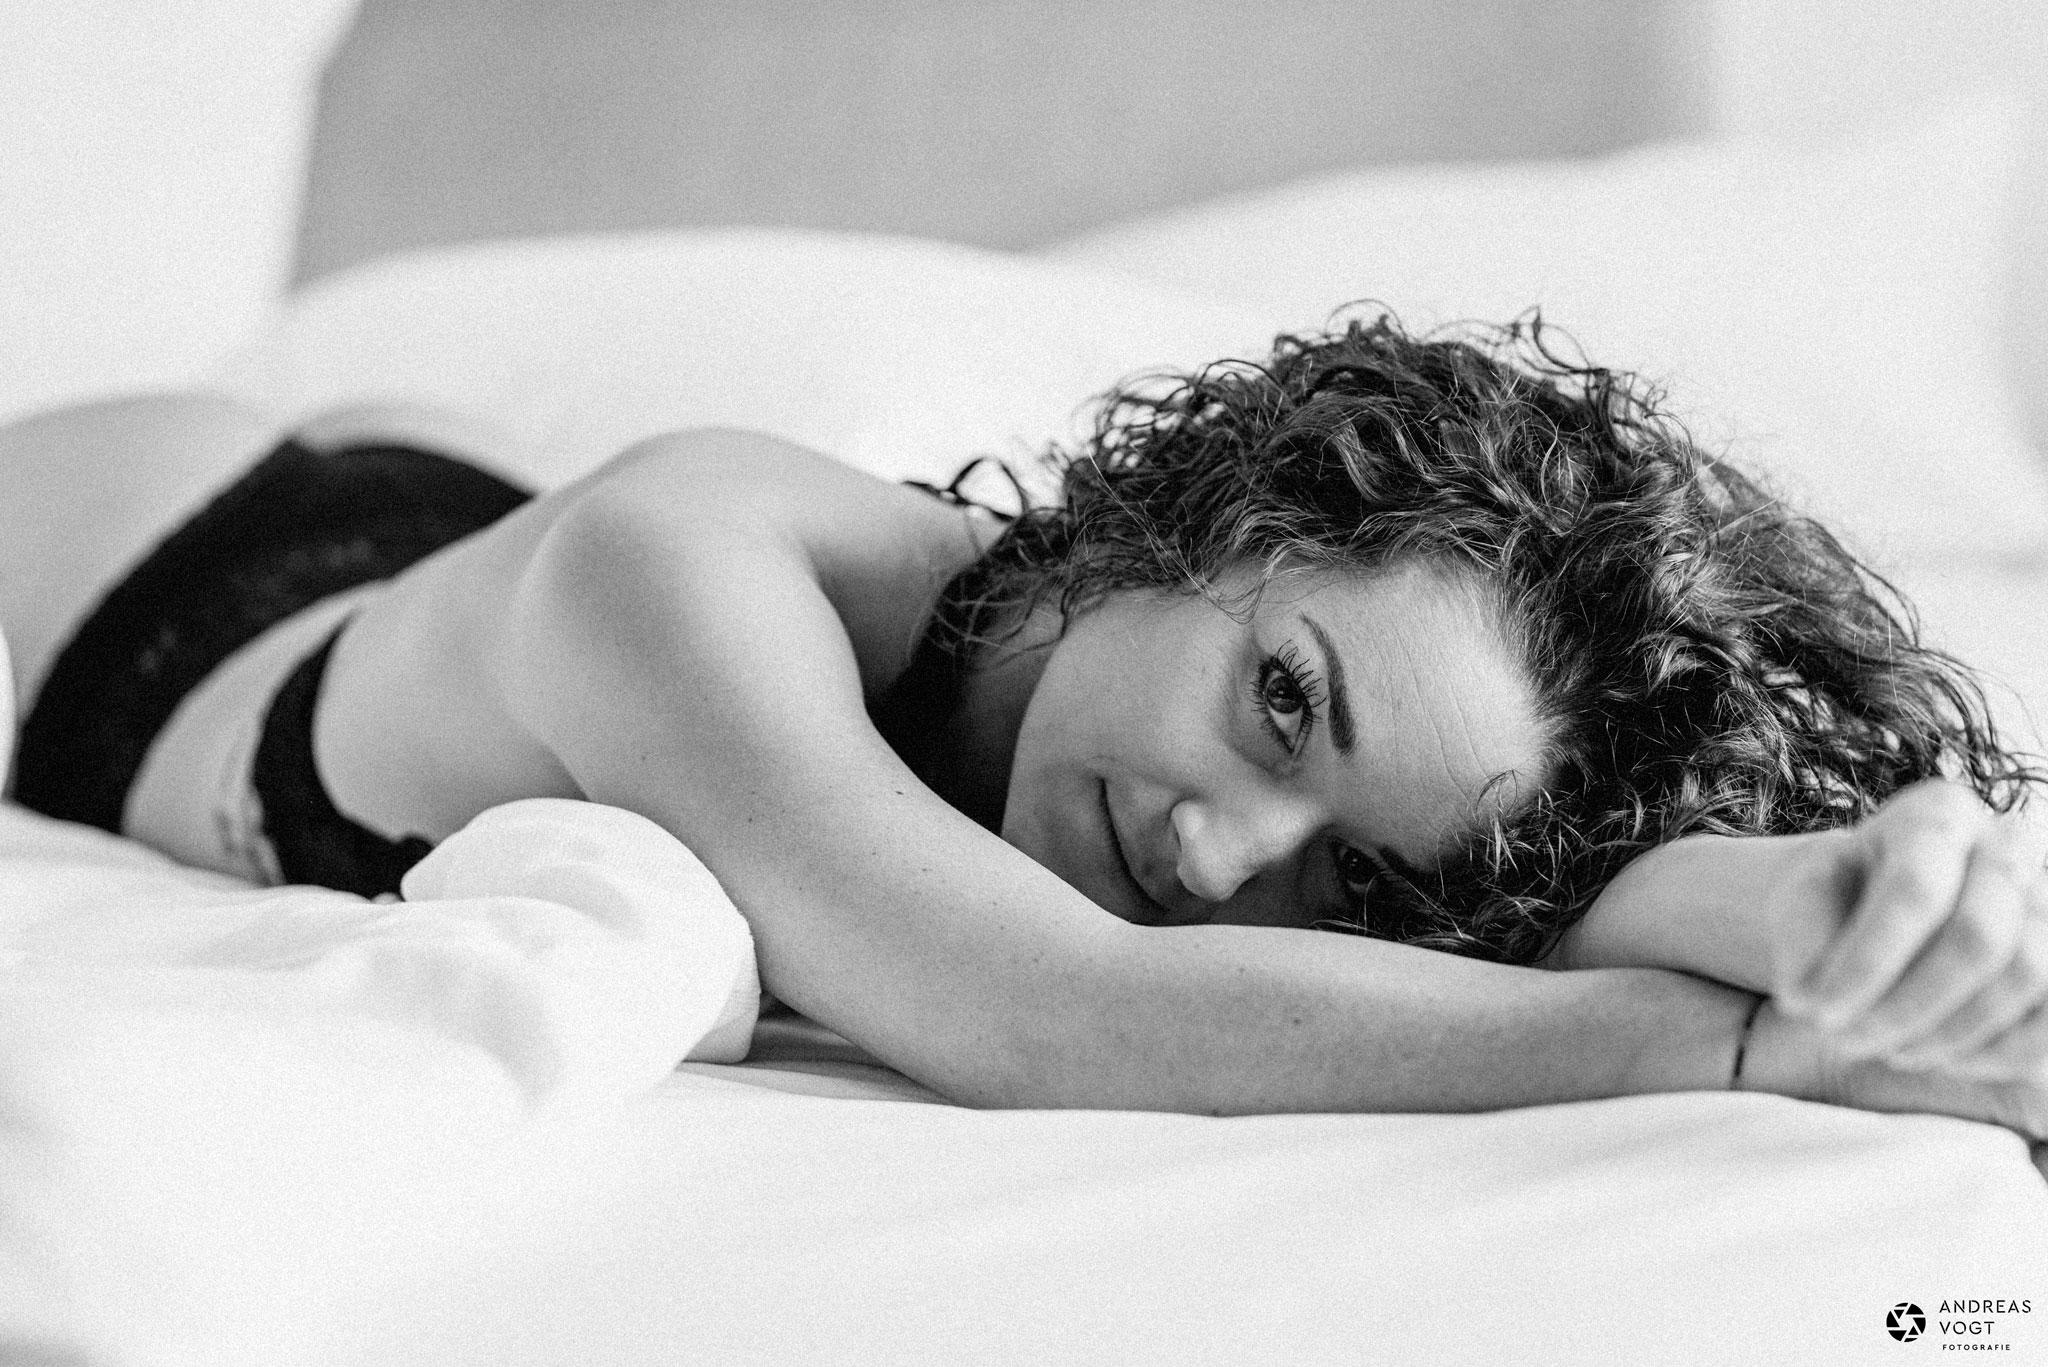 dessousfotos mit andrea im hotelzimmer - fotograf andreas vogt aus aalen